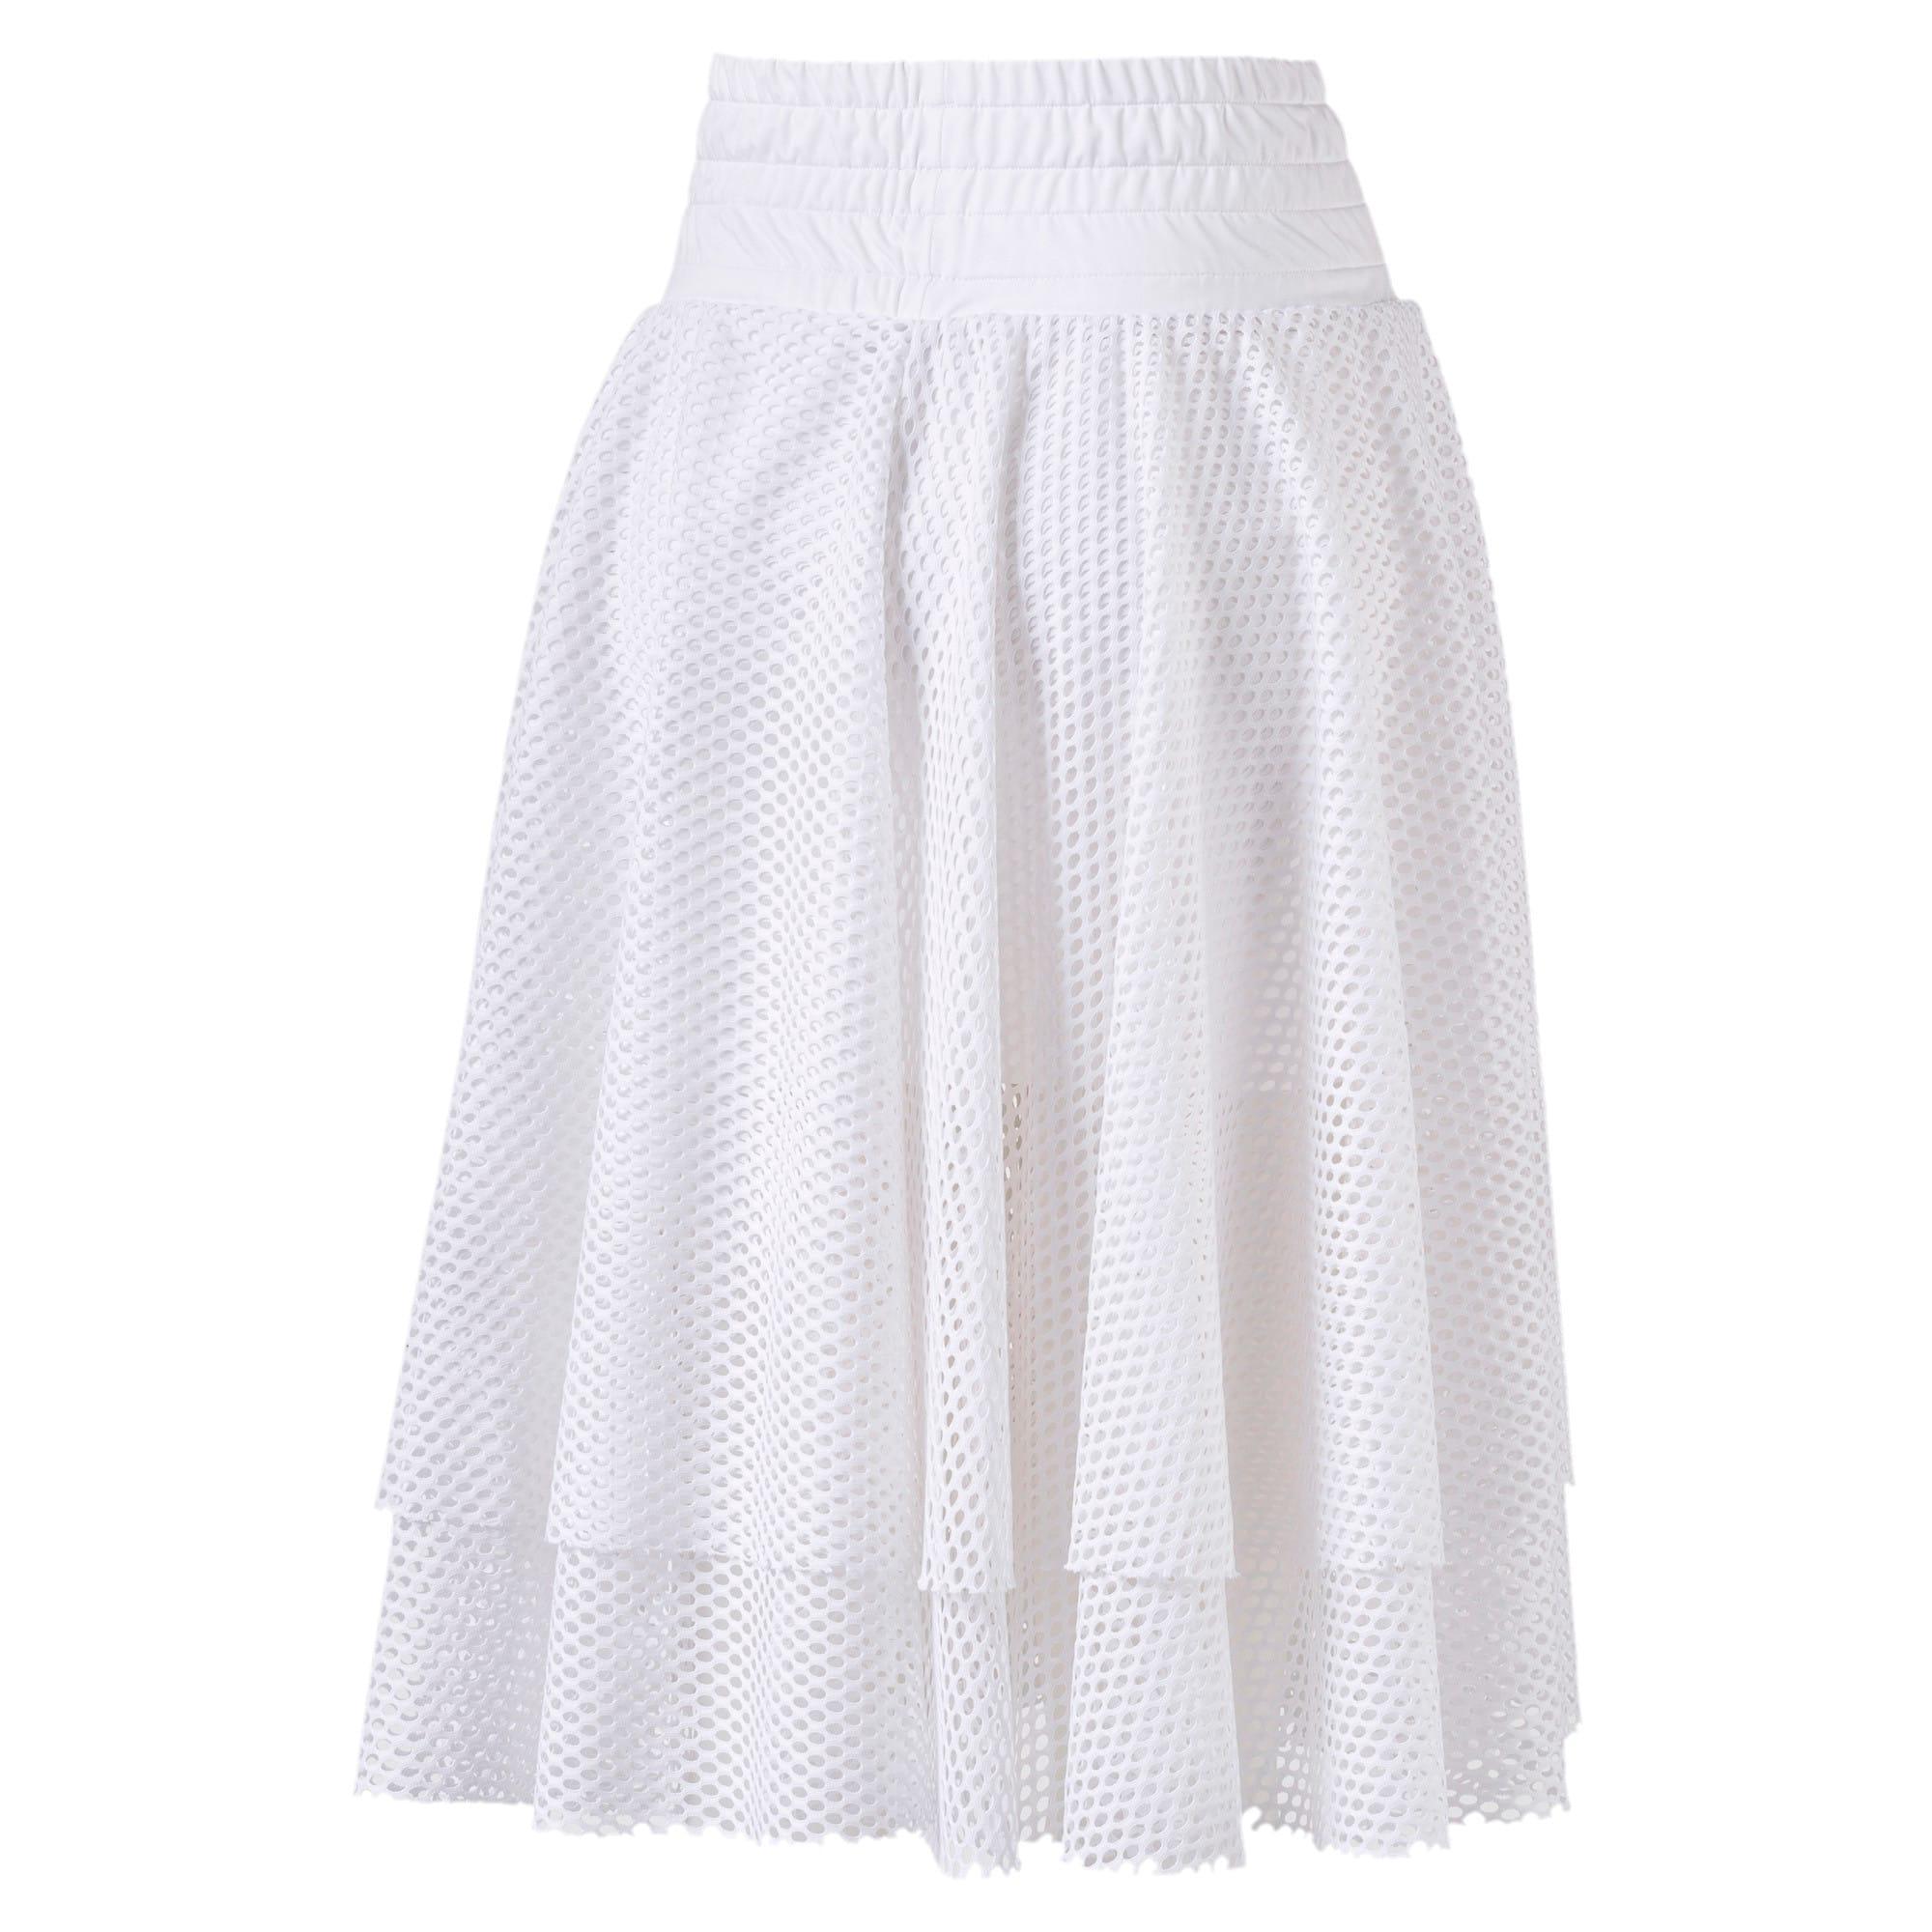 Thumbnail 5 of En Pointe Women's Skirt, Puma White, medium-IND